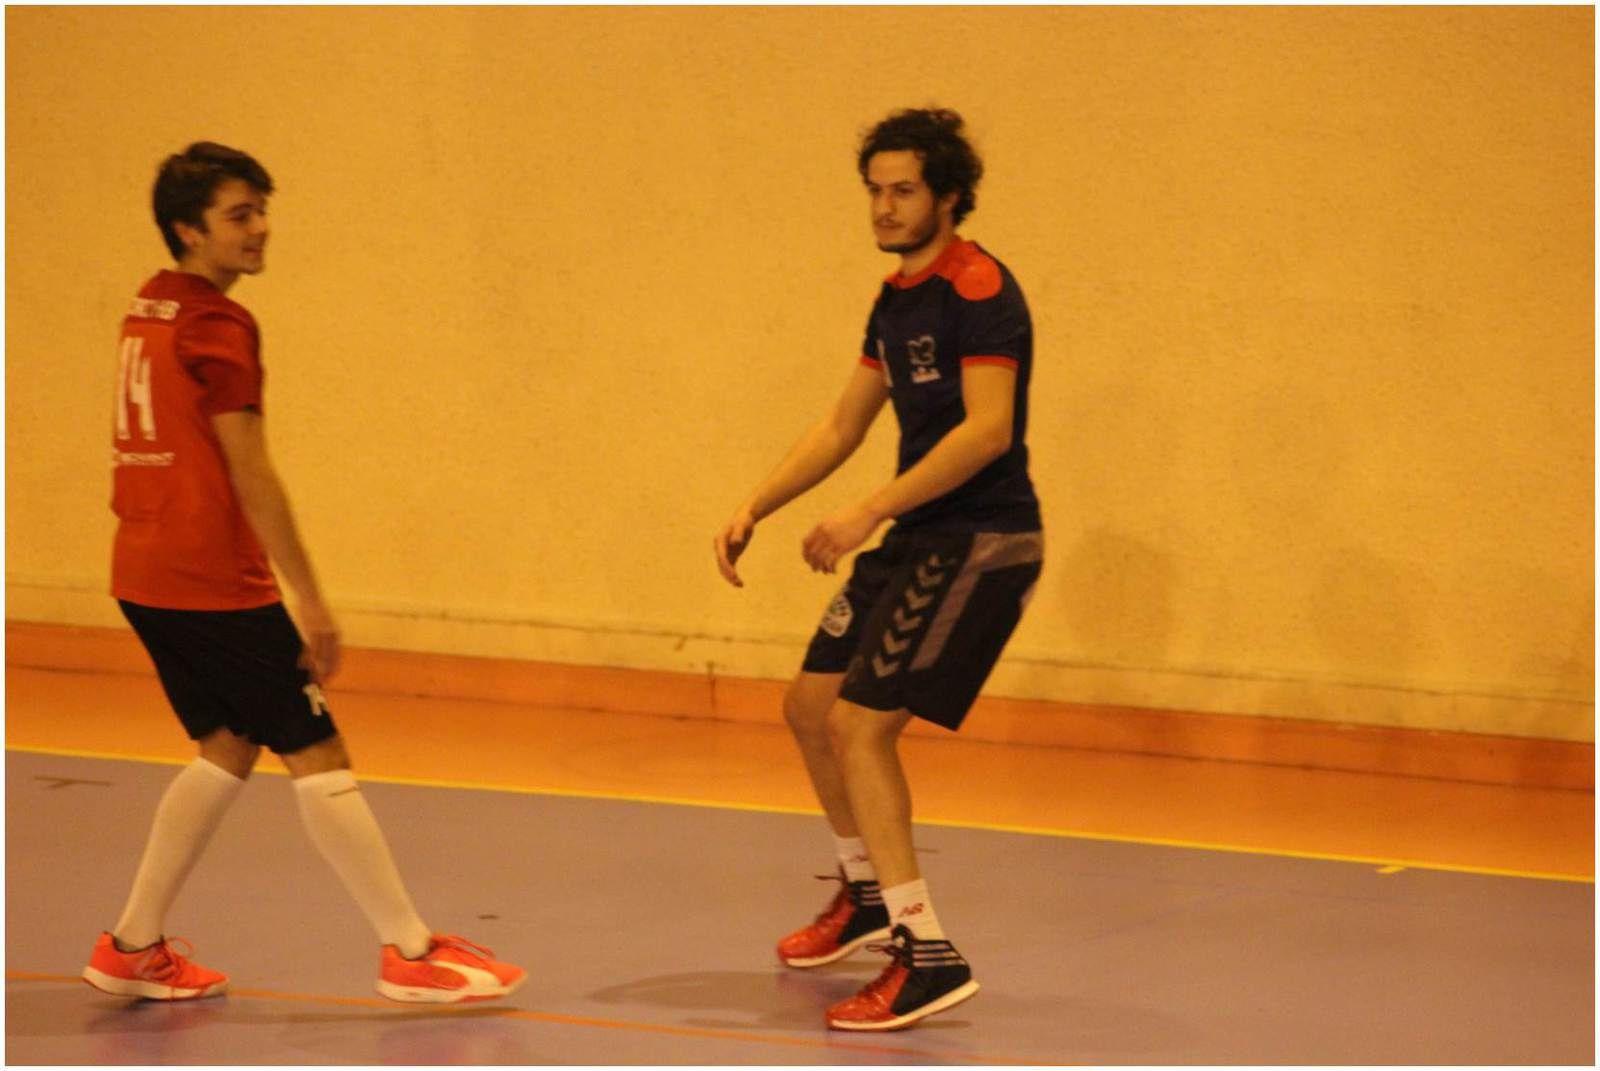 THBMLV 2 vs ROSNY-SOUS-BOIS (Prépa Séniors - 06.01.2016)